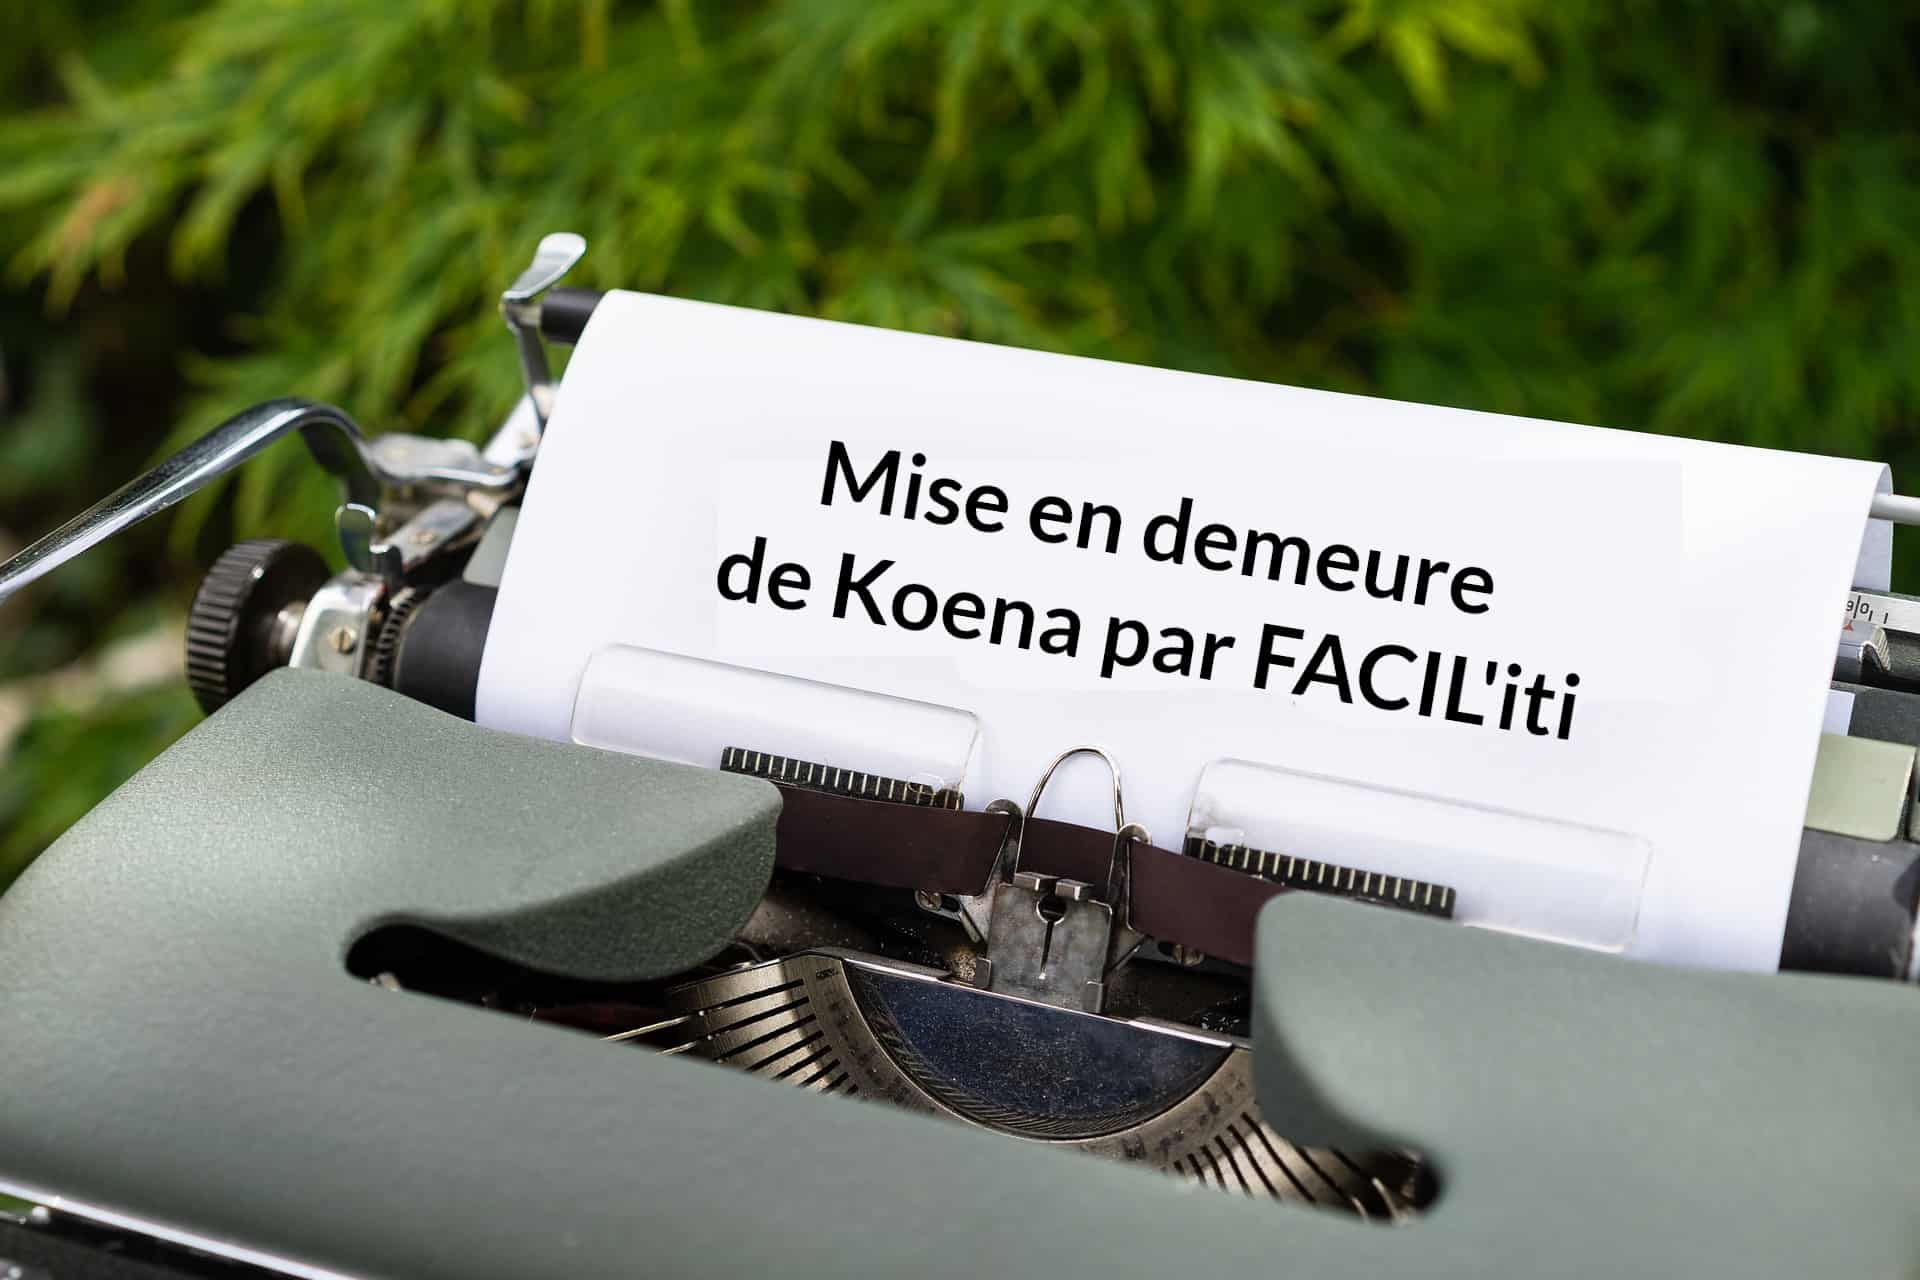 Mise en demeure de Koena par FACIL'iti